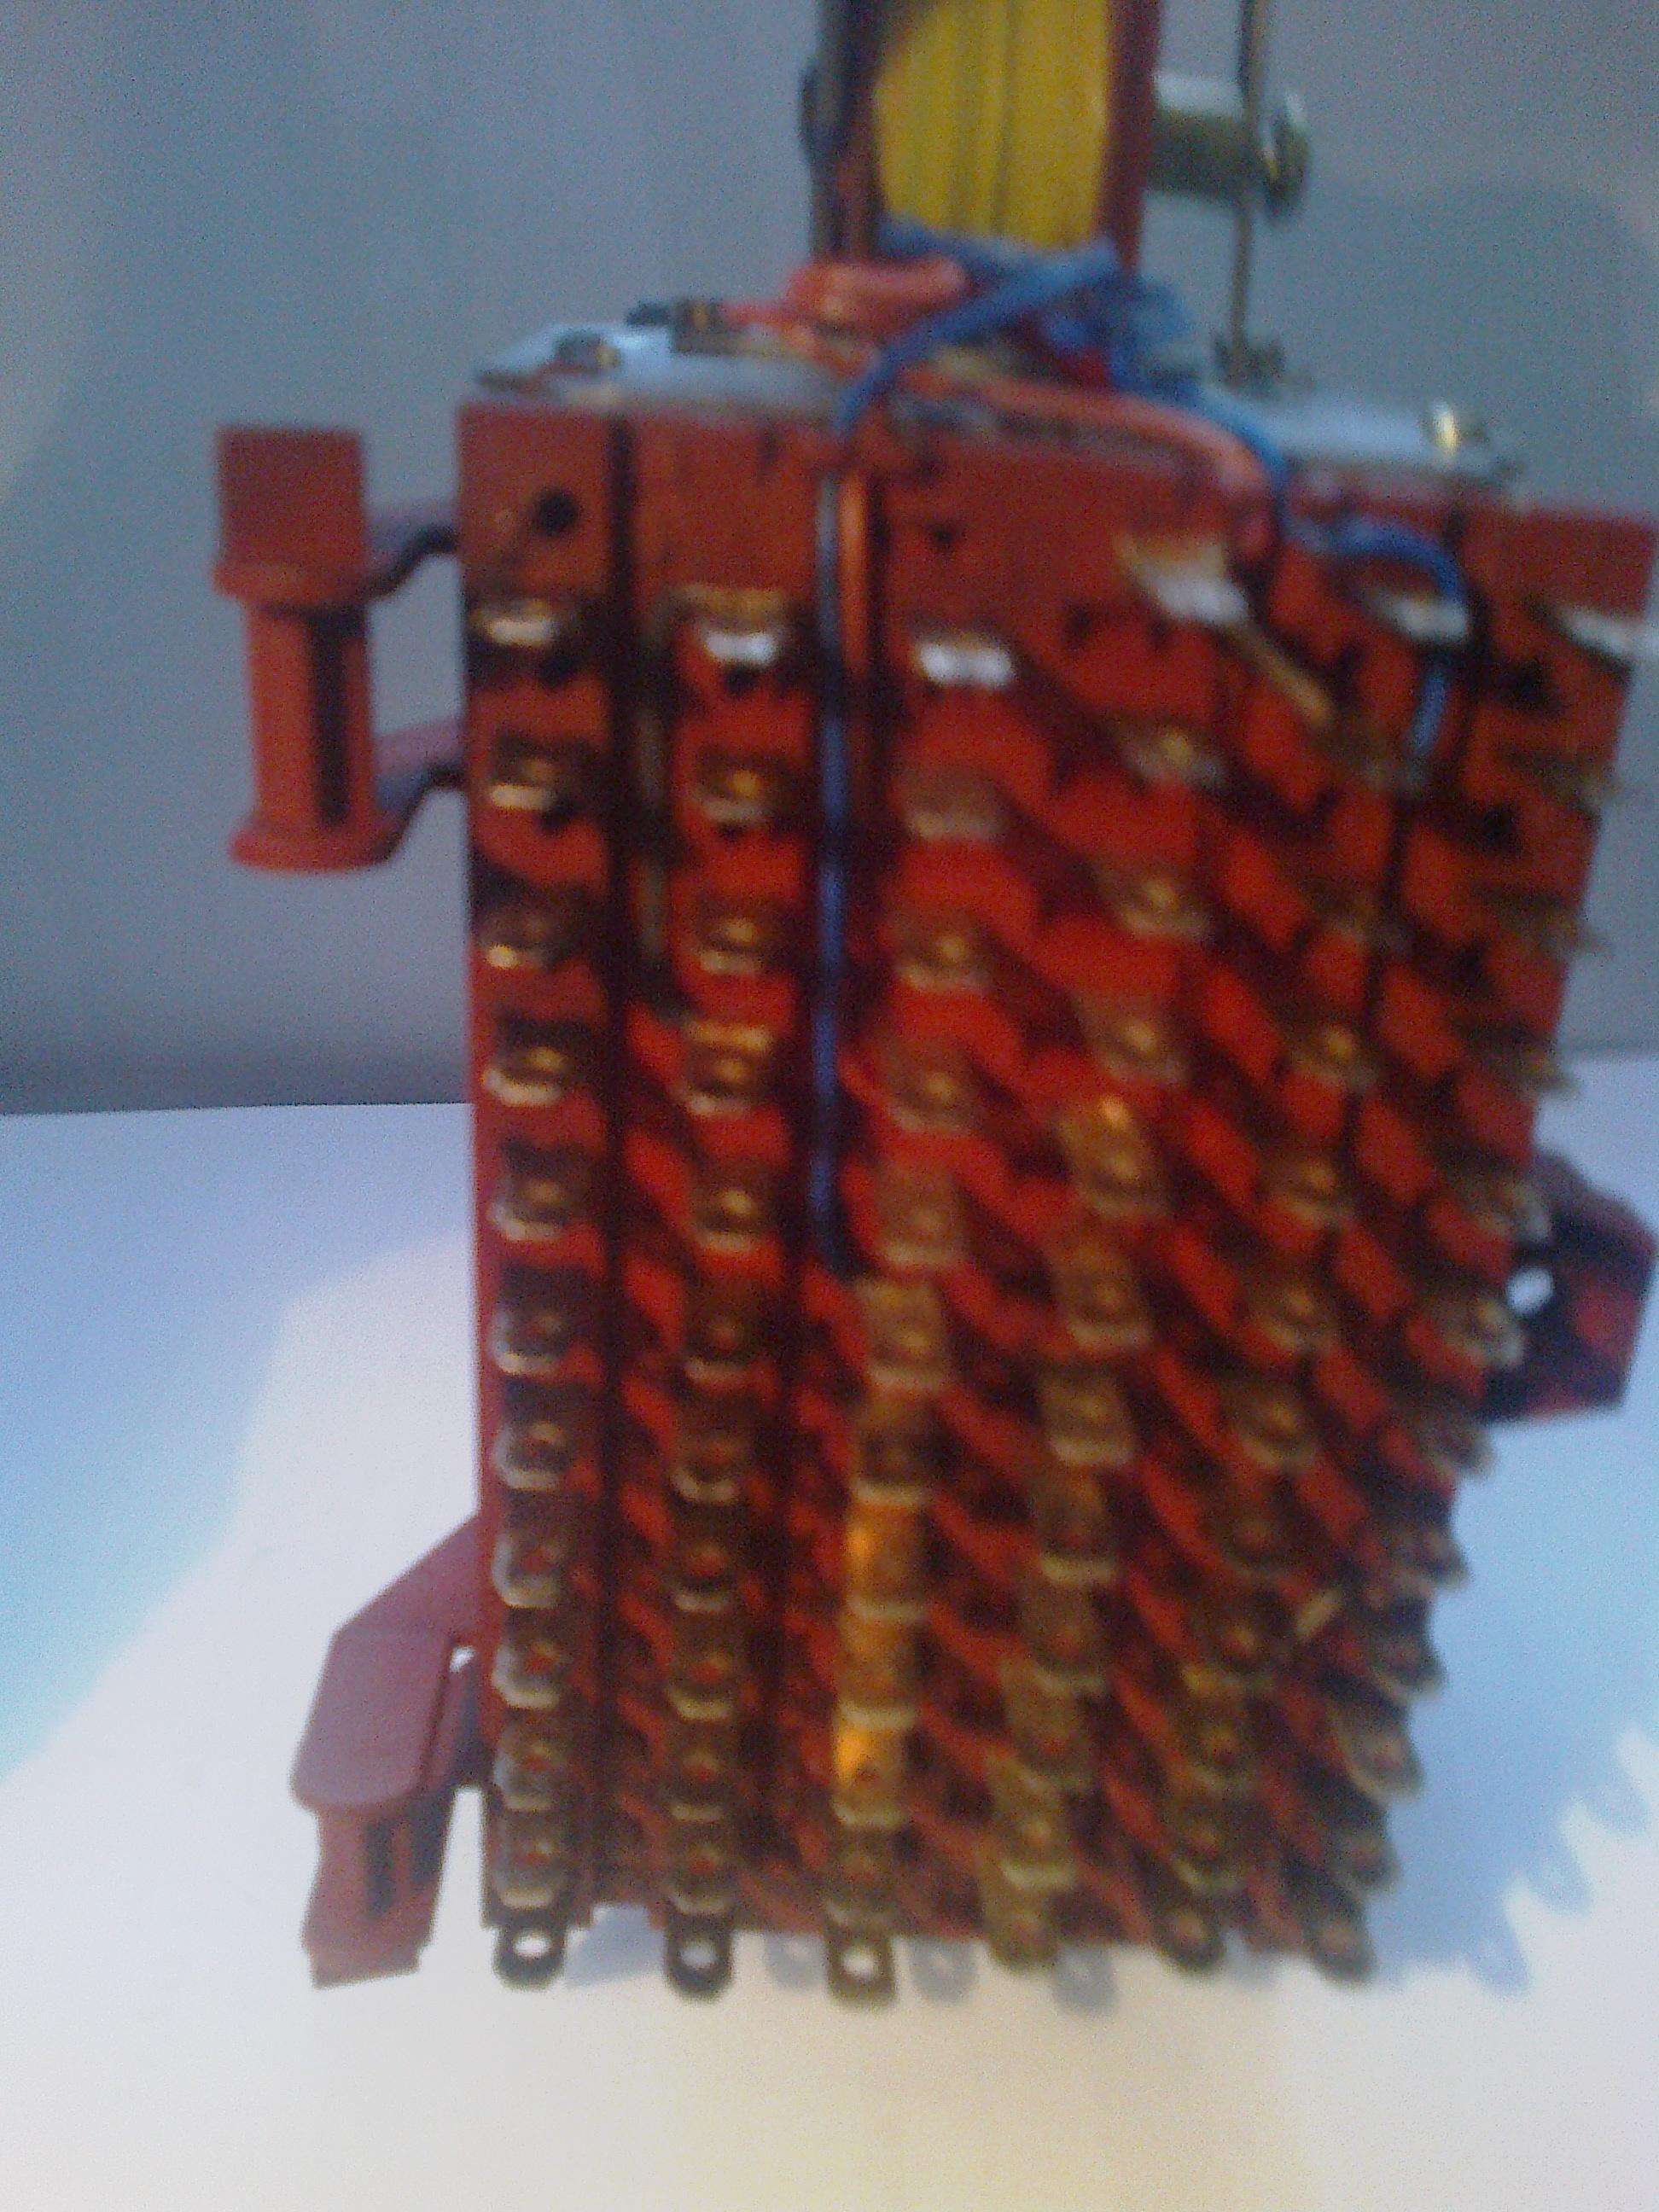 [Kupi�] Programator Siemens 2HK4 433-2N